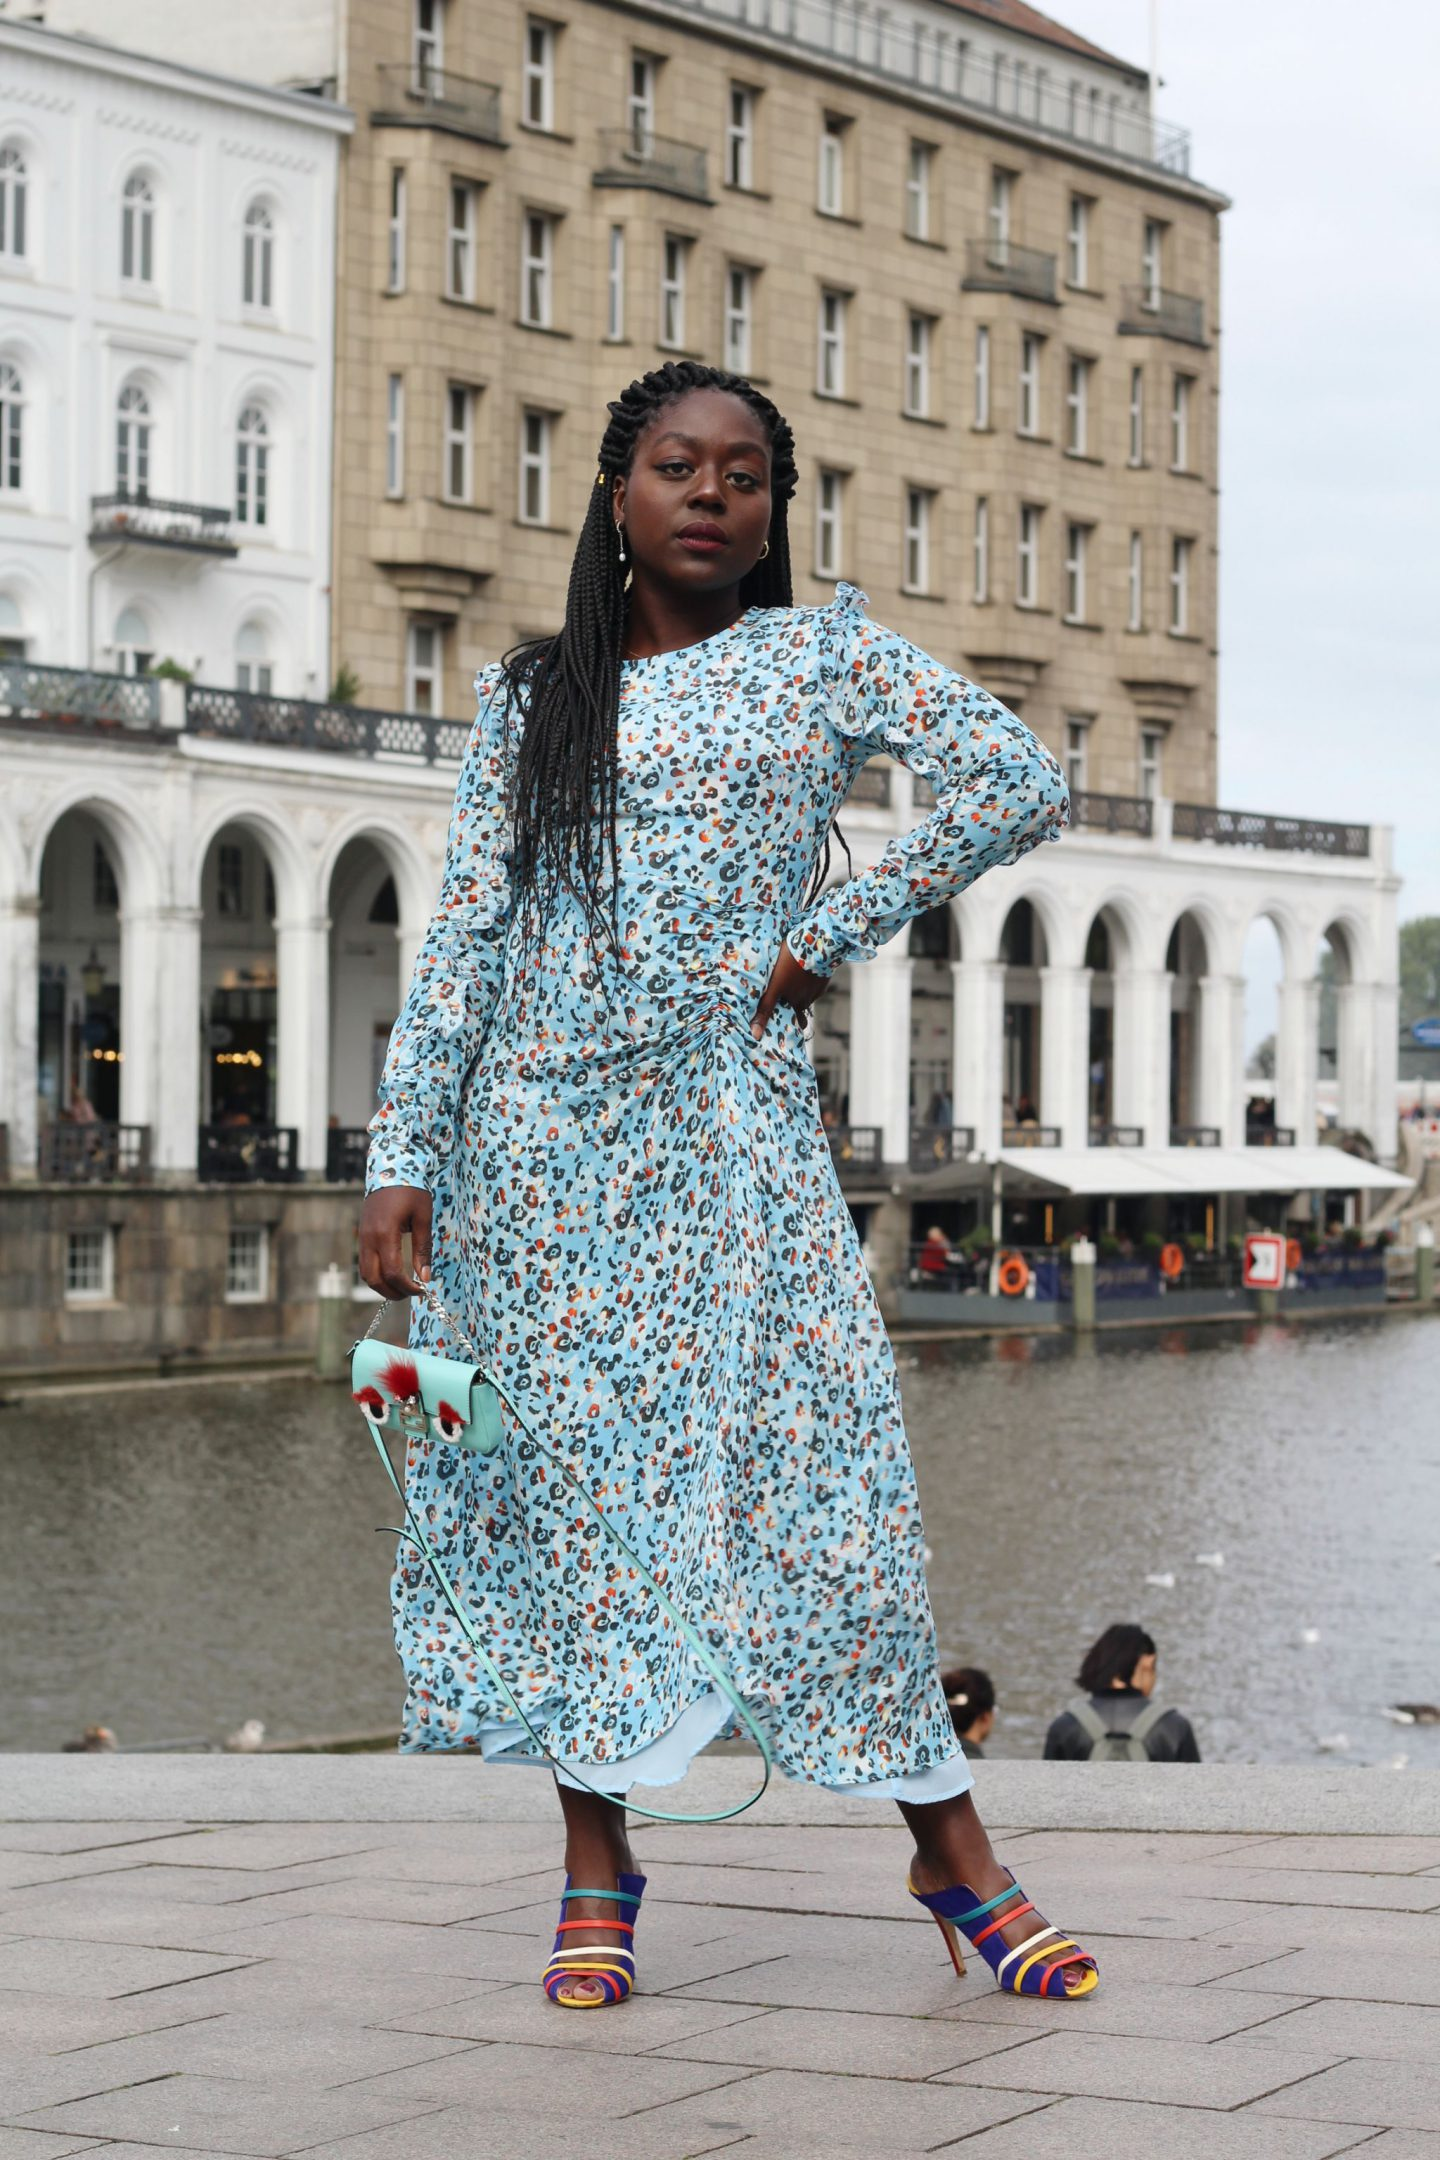 Lala_Berlin_Streetstyle_Lois_Opoku_Fashion_Blogger_Fendi_Monster_Malone_Souliers_lisforlois_4